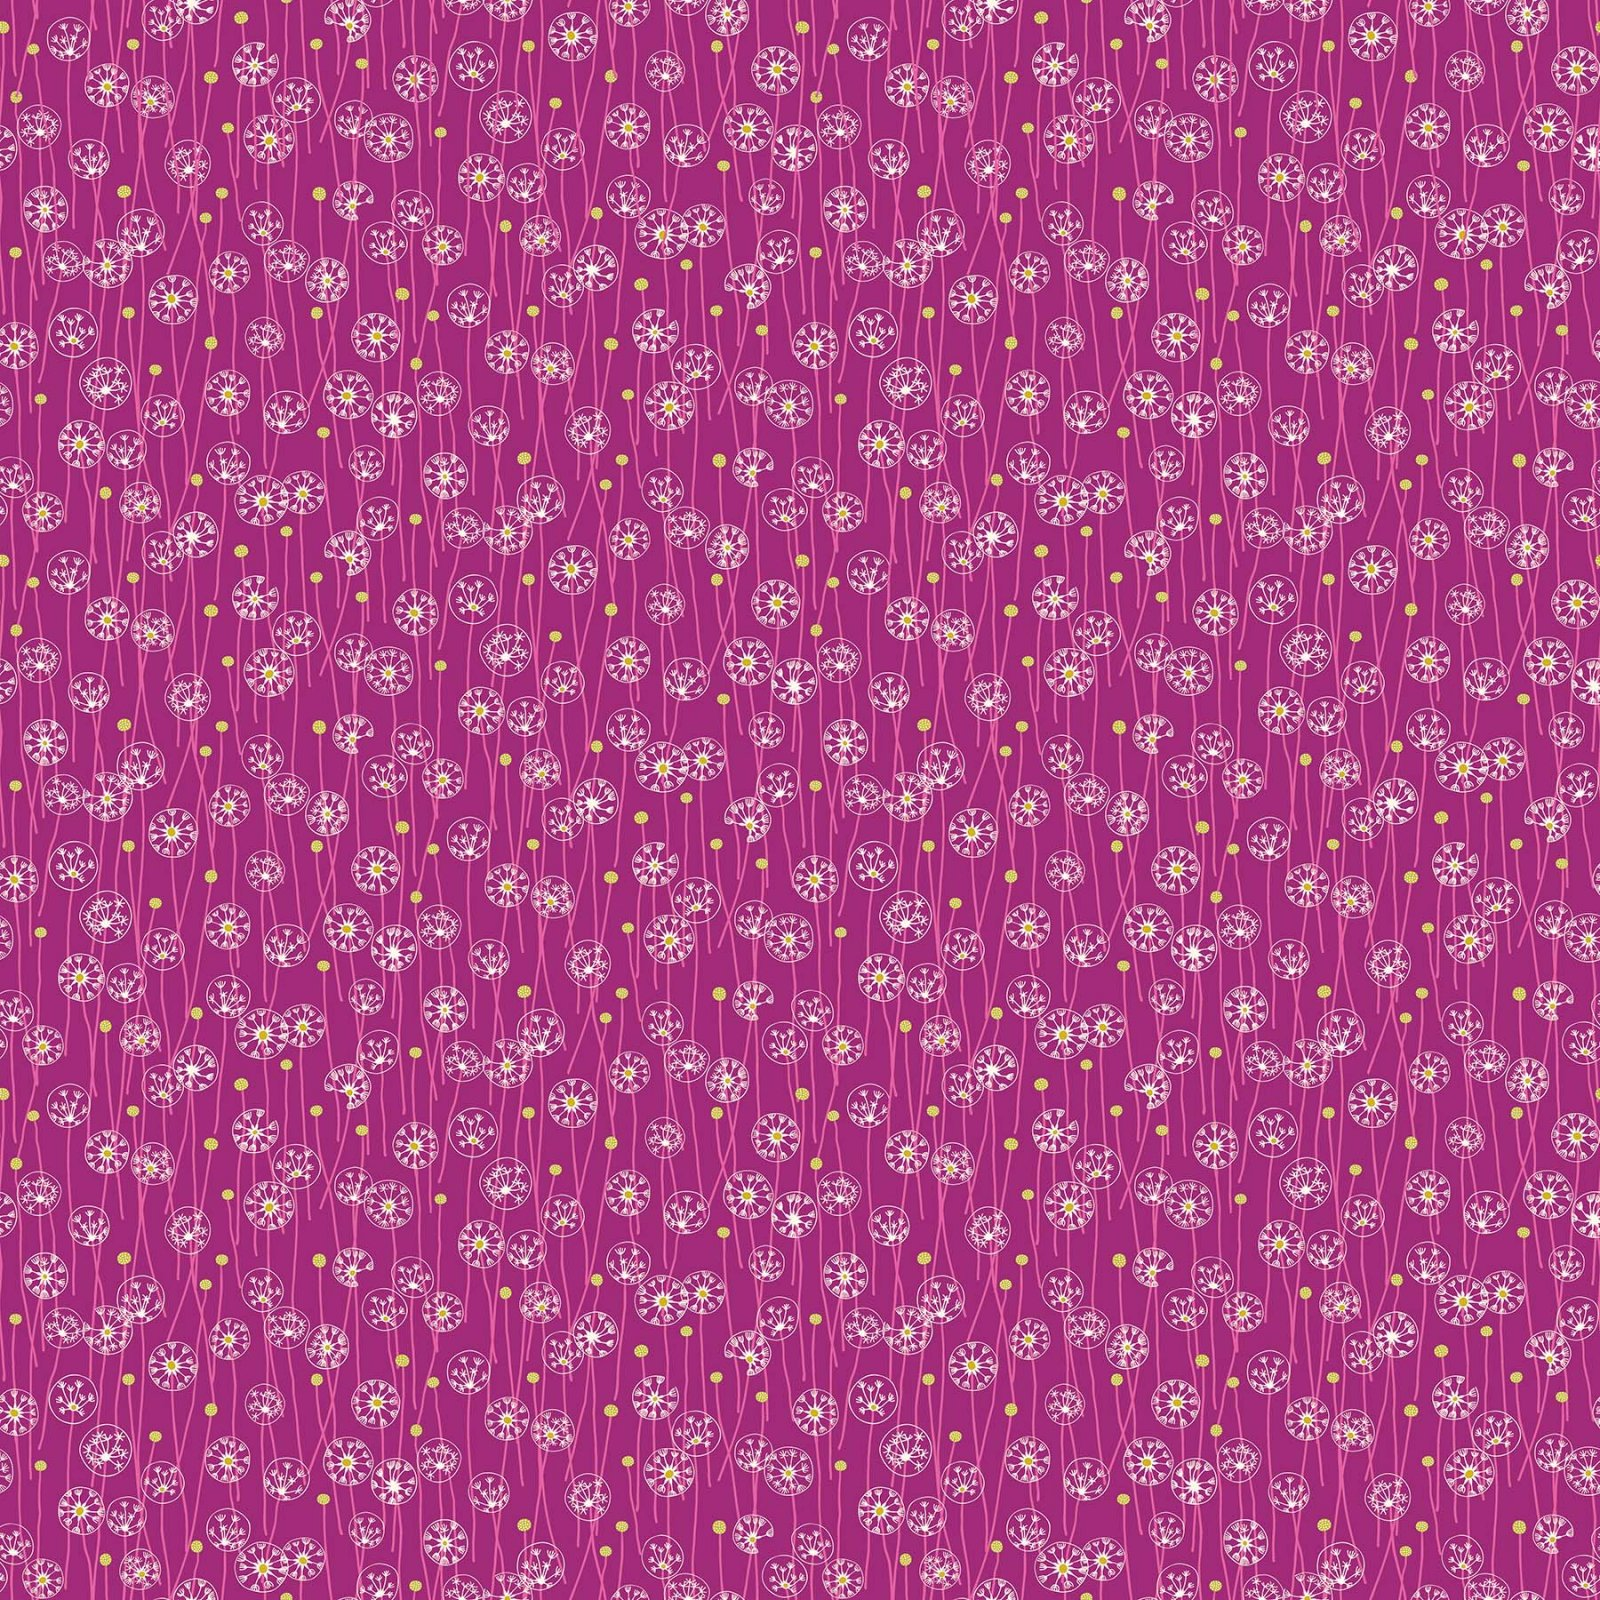 FIGO Fabrics Mountain Meadow DANDELION FIELD (Purple)